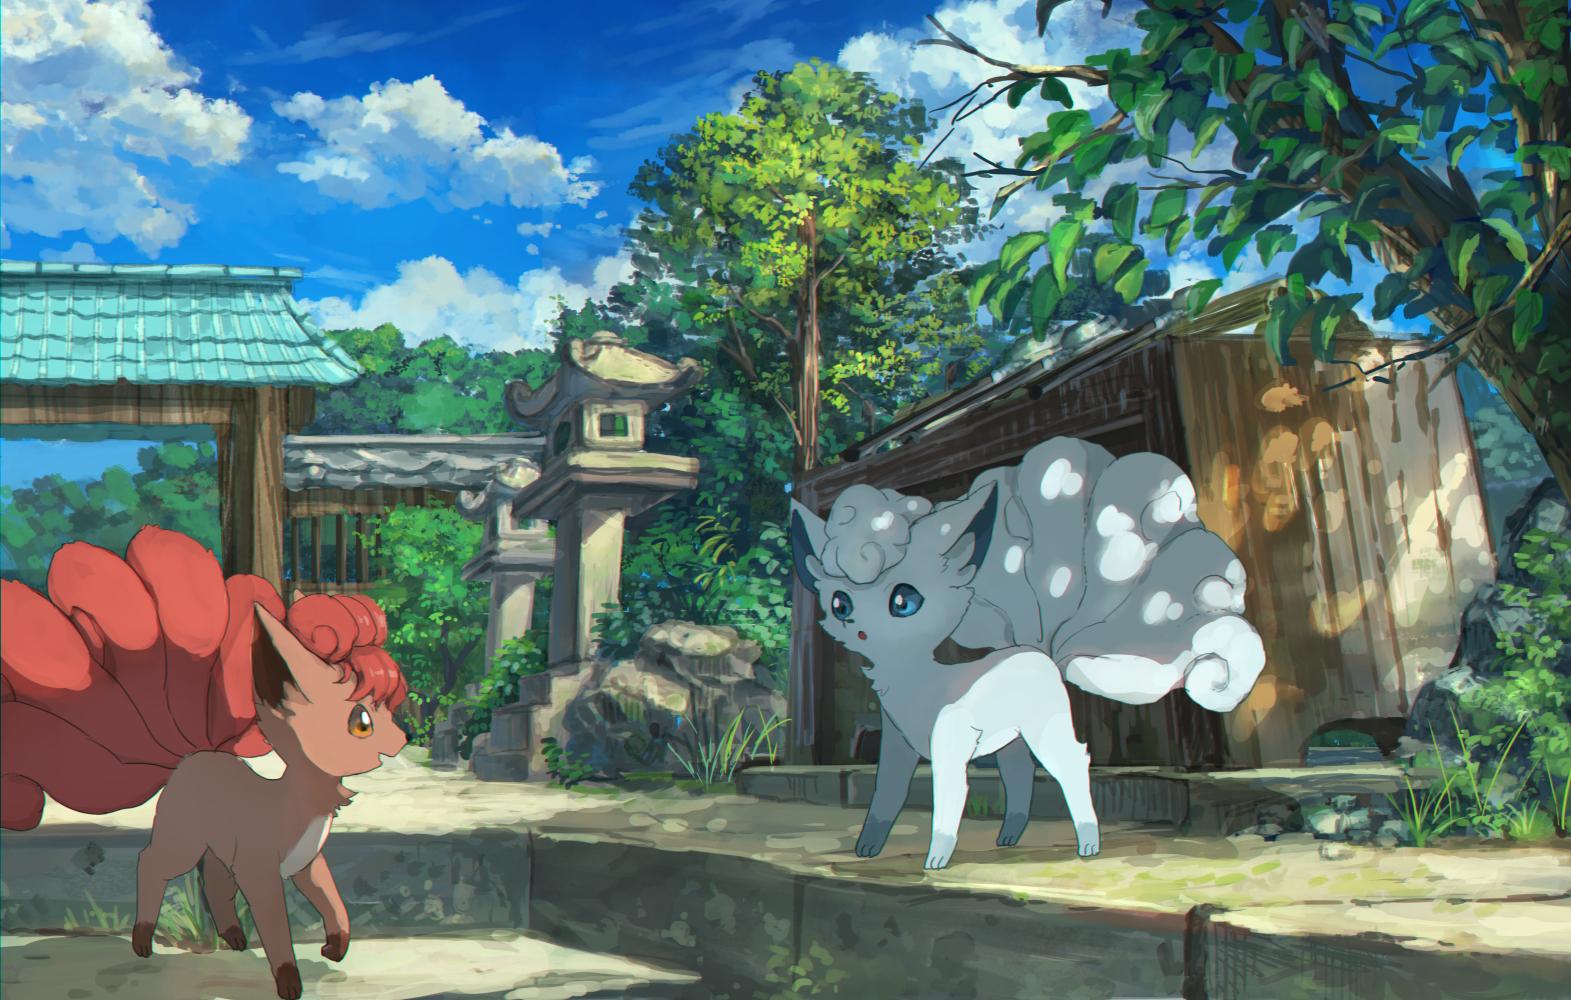 【p站画师】日本画师ぴっぴ的插画作品,一位风景画师